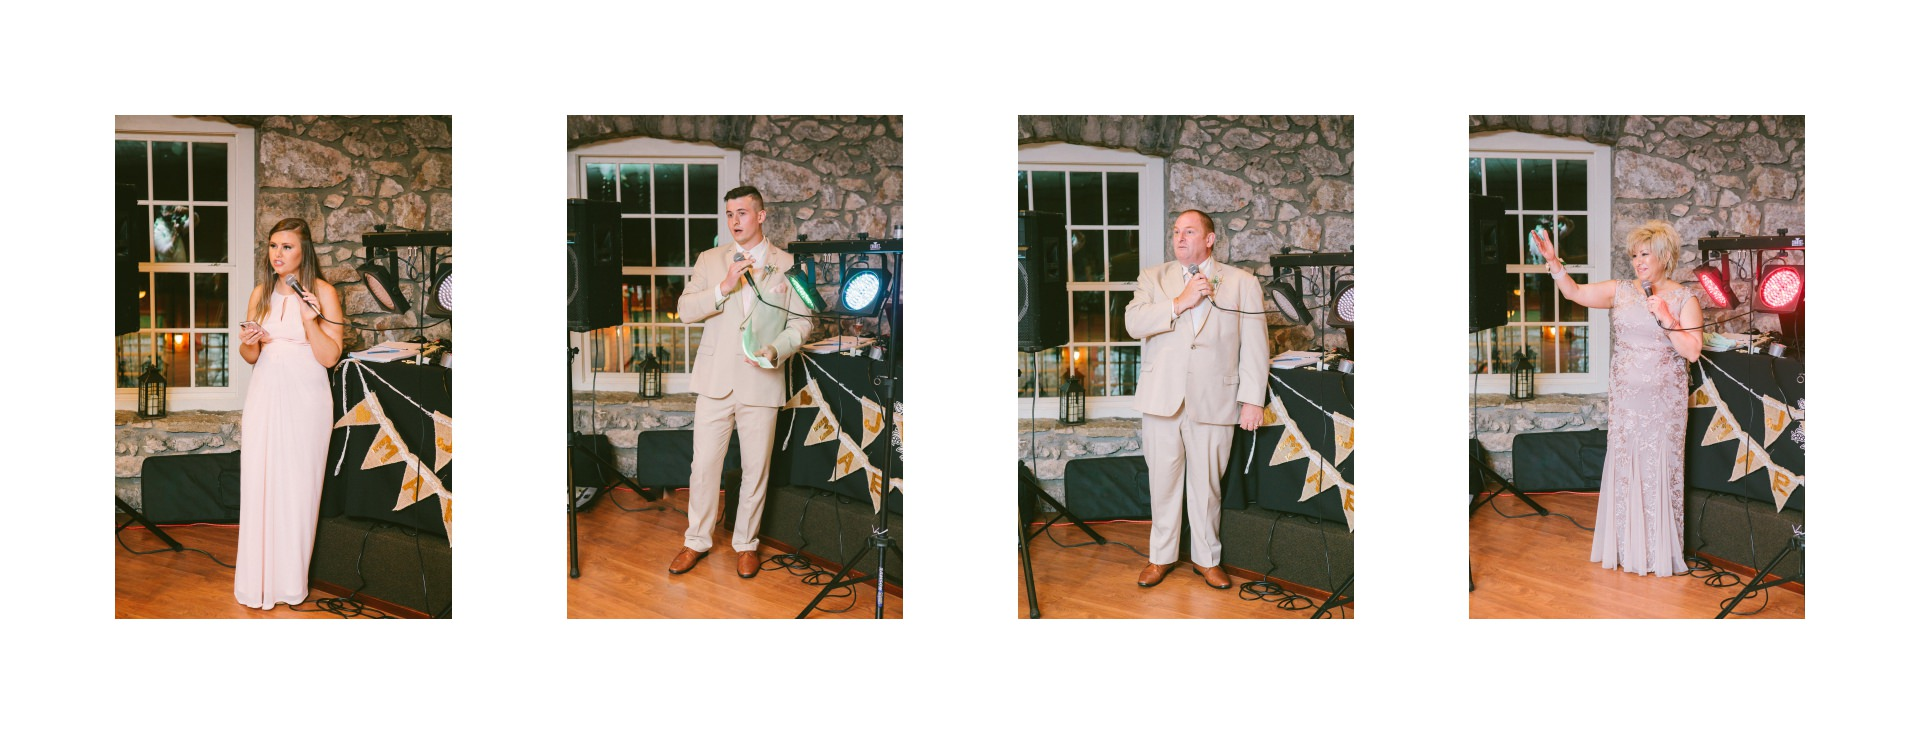 Mon Ami Winery Wedding in Port Clinton 1 45.jpg